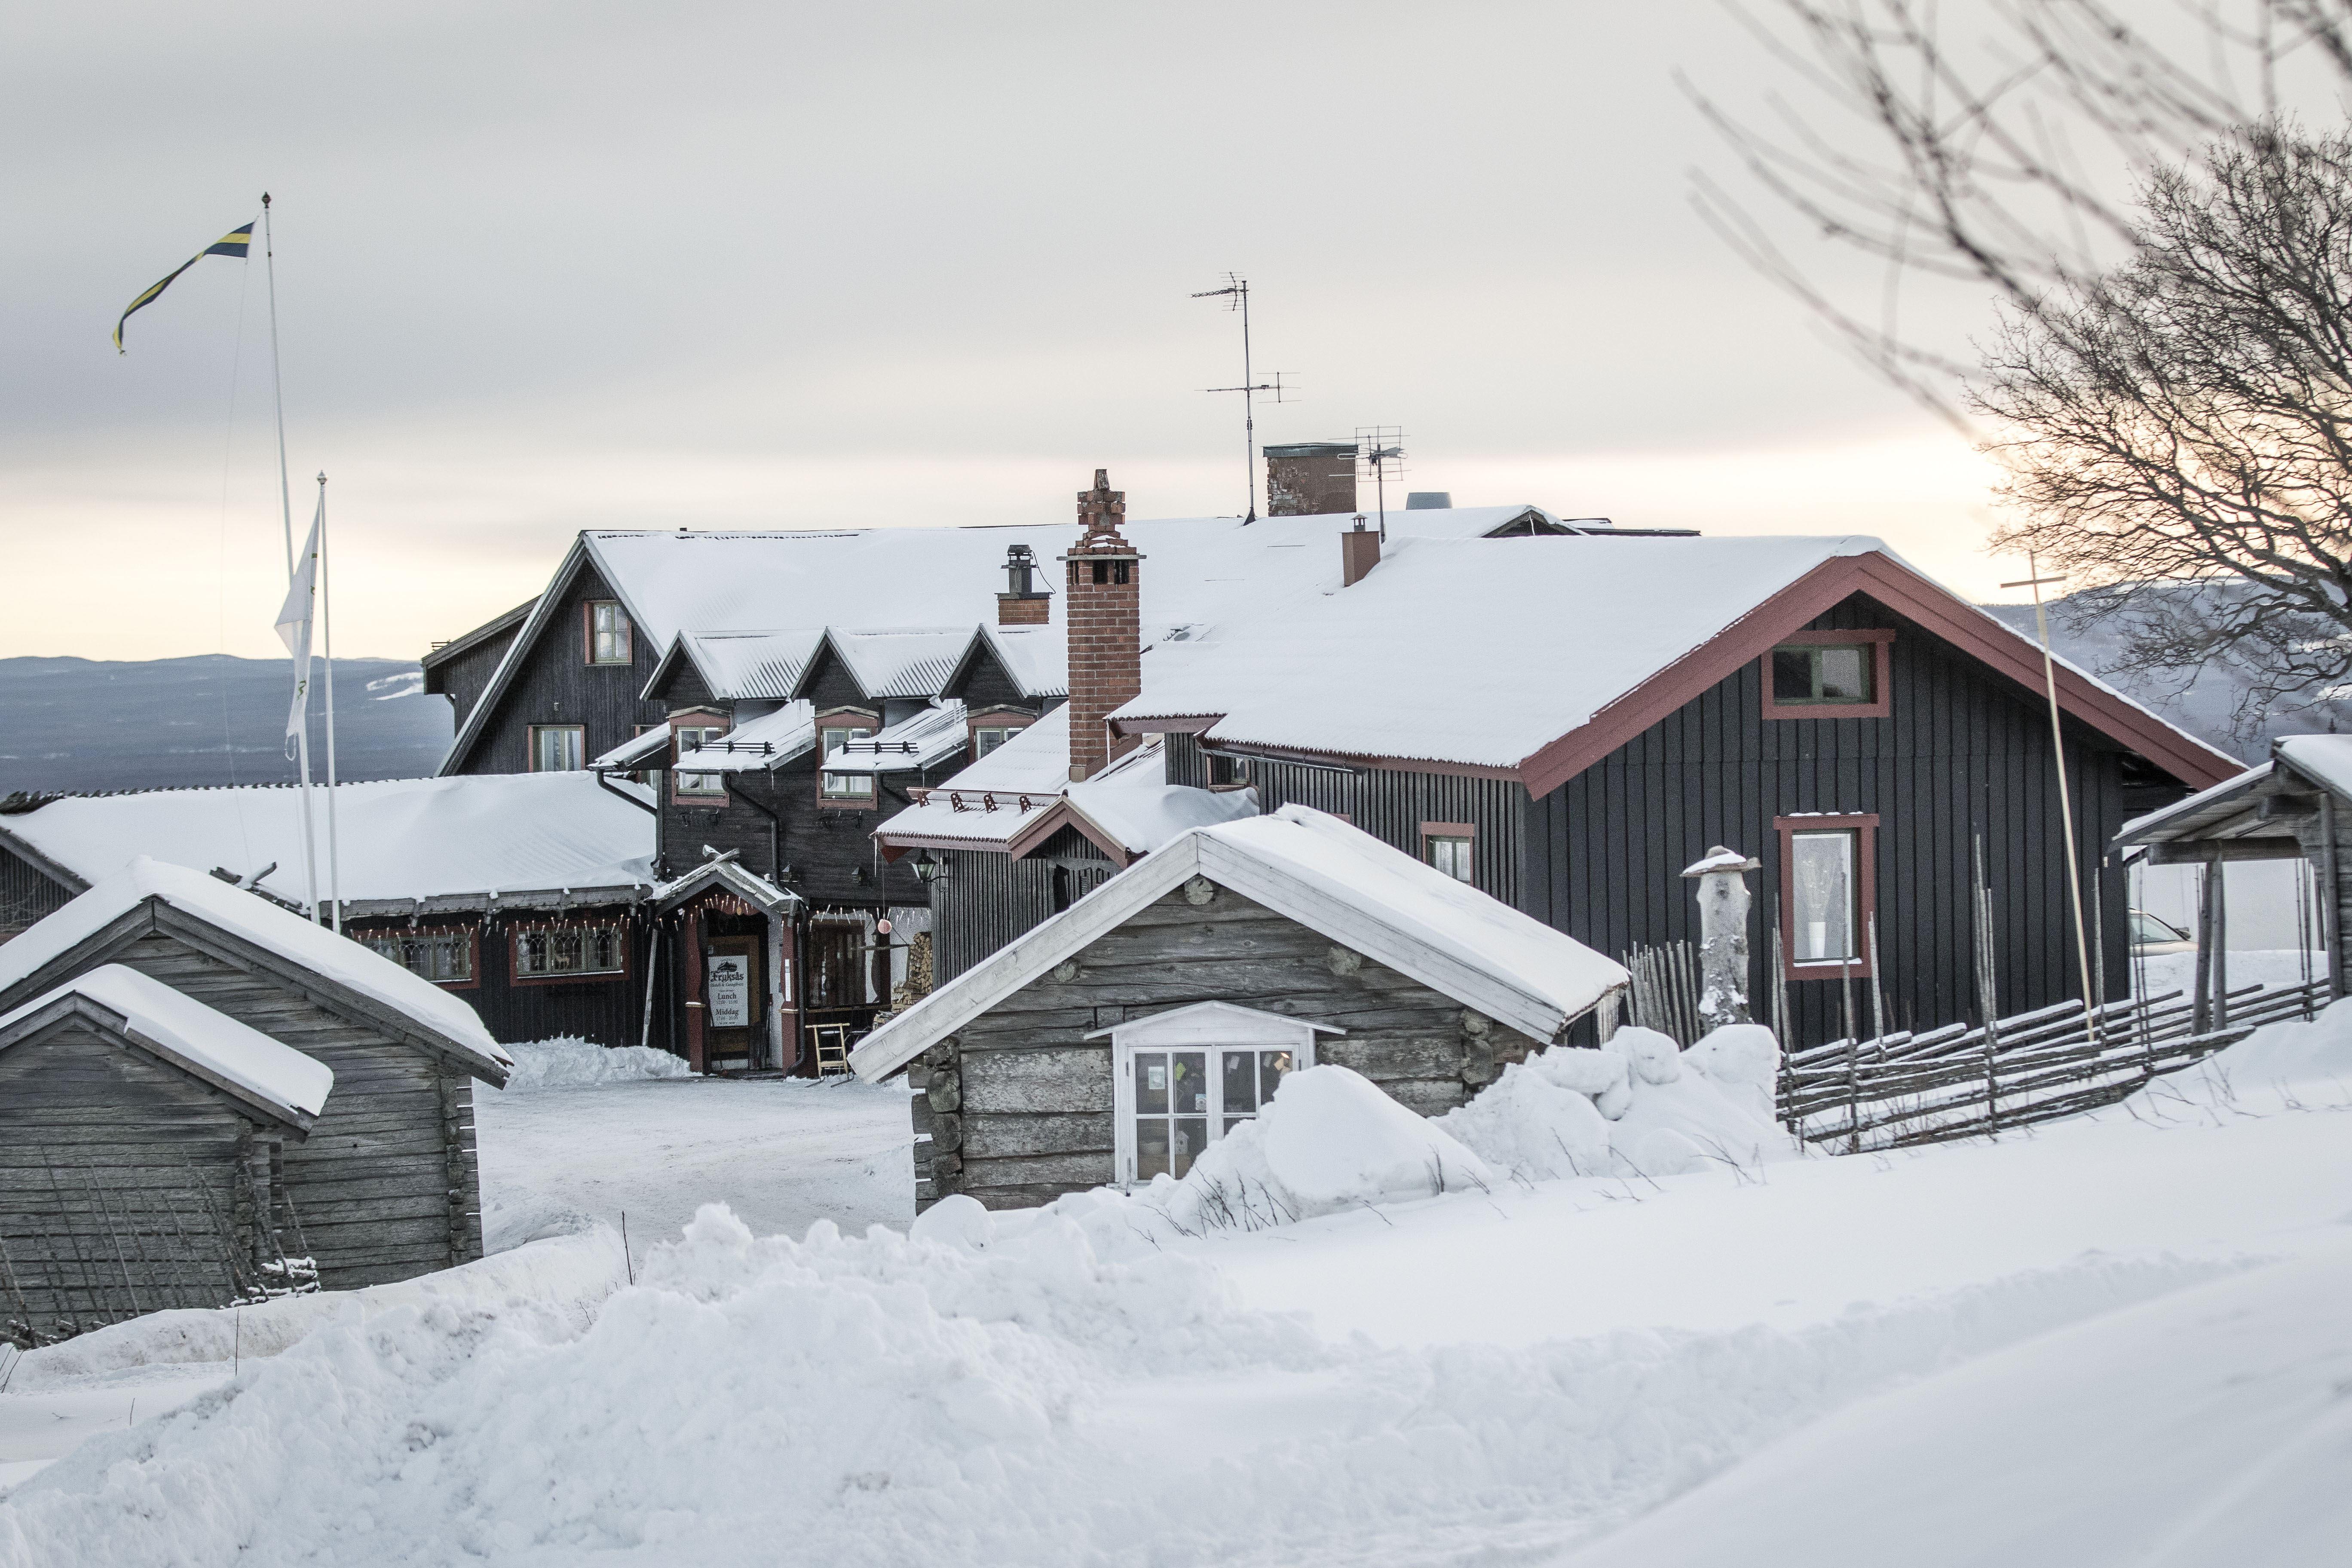 Fryksås Hotell & Gestgifveri